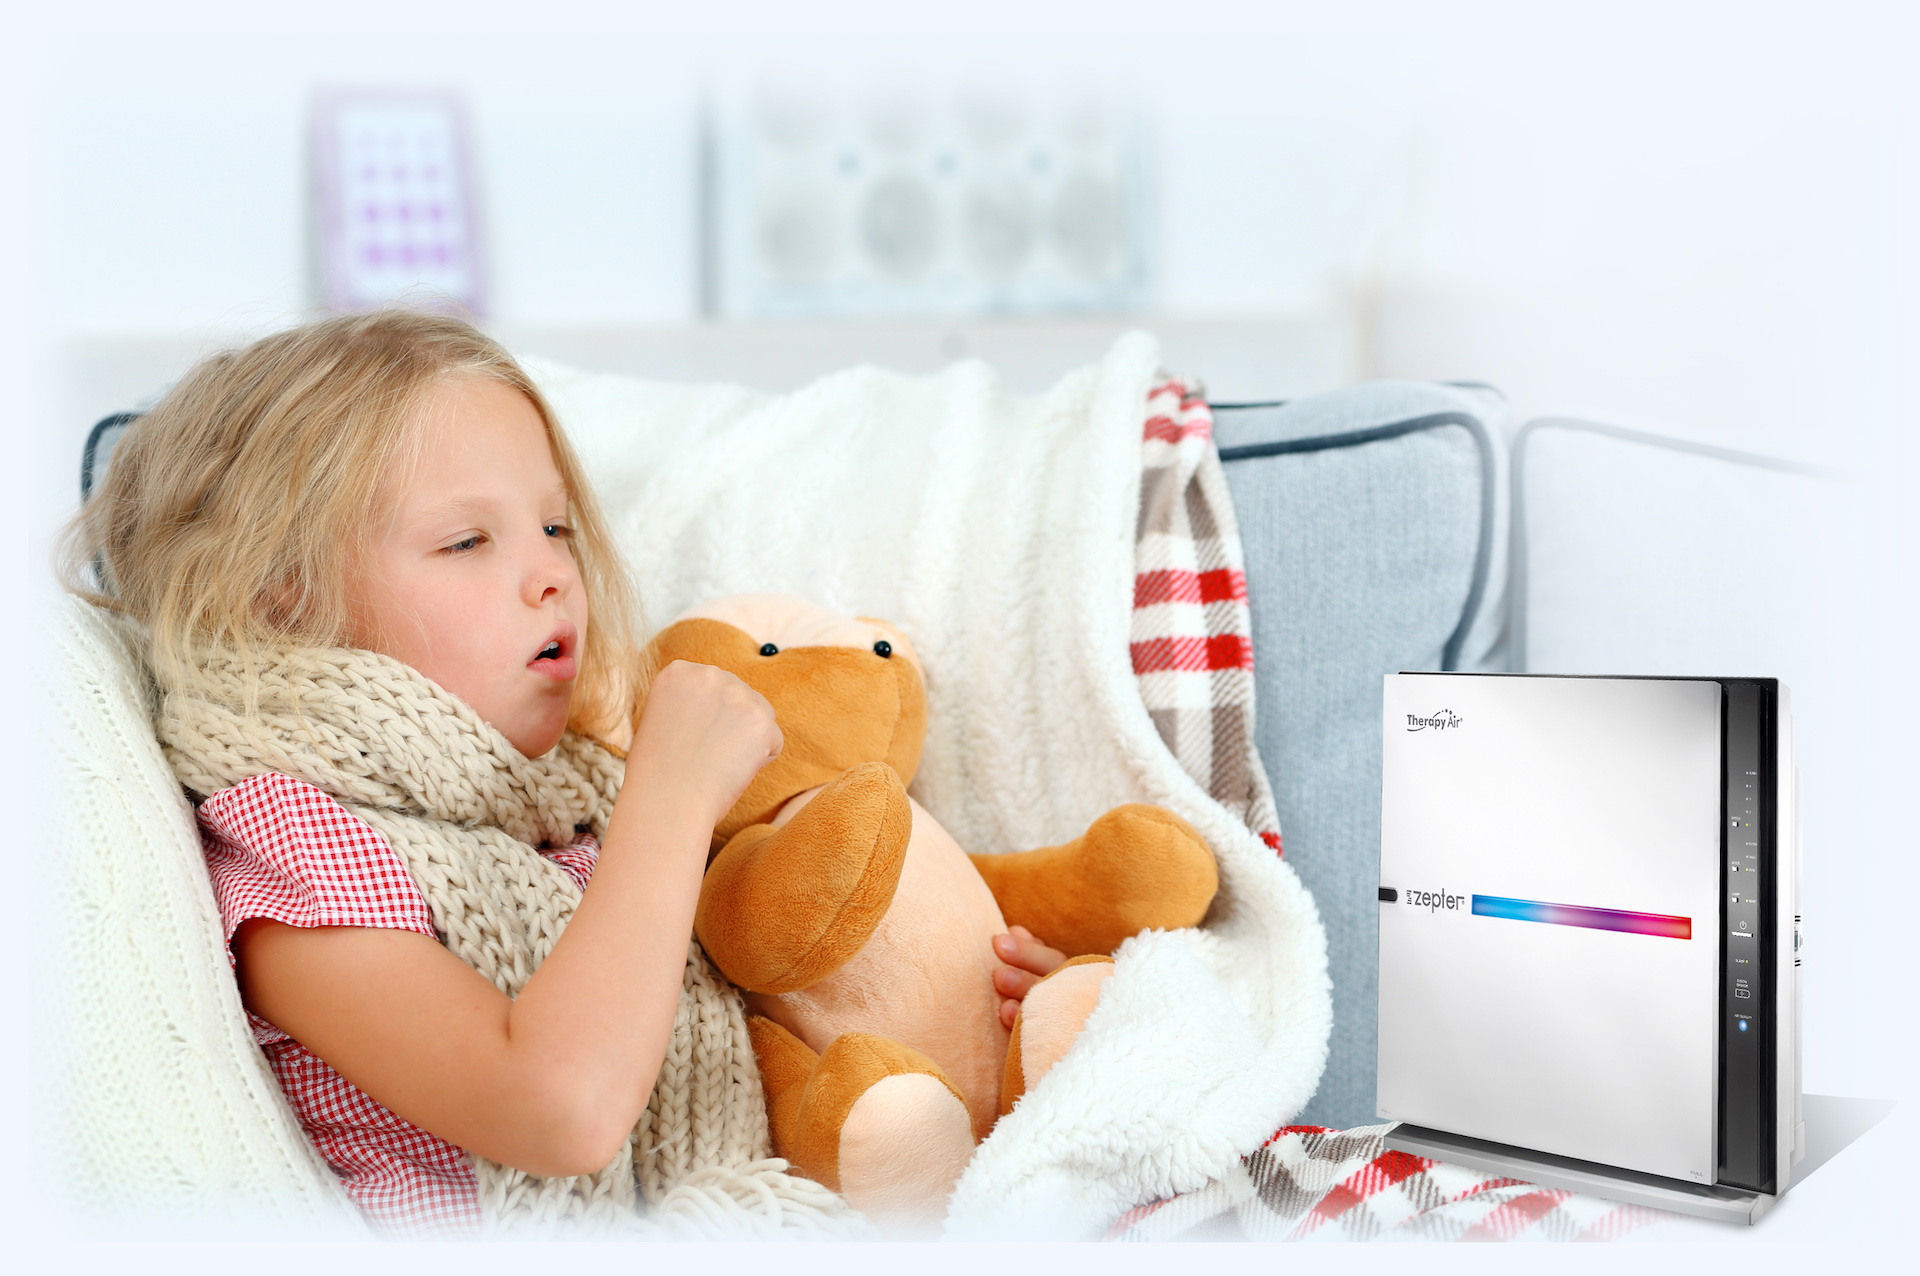 Uređaj Therapy Air iOn dokazano pročišćuje i uklanja viruse iz porodice COVID iz zraka!